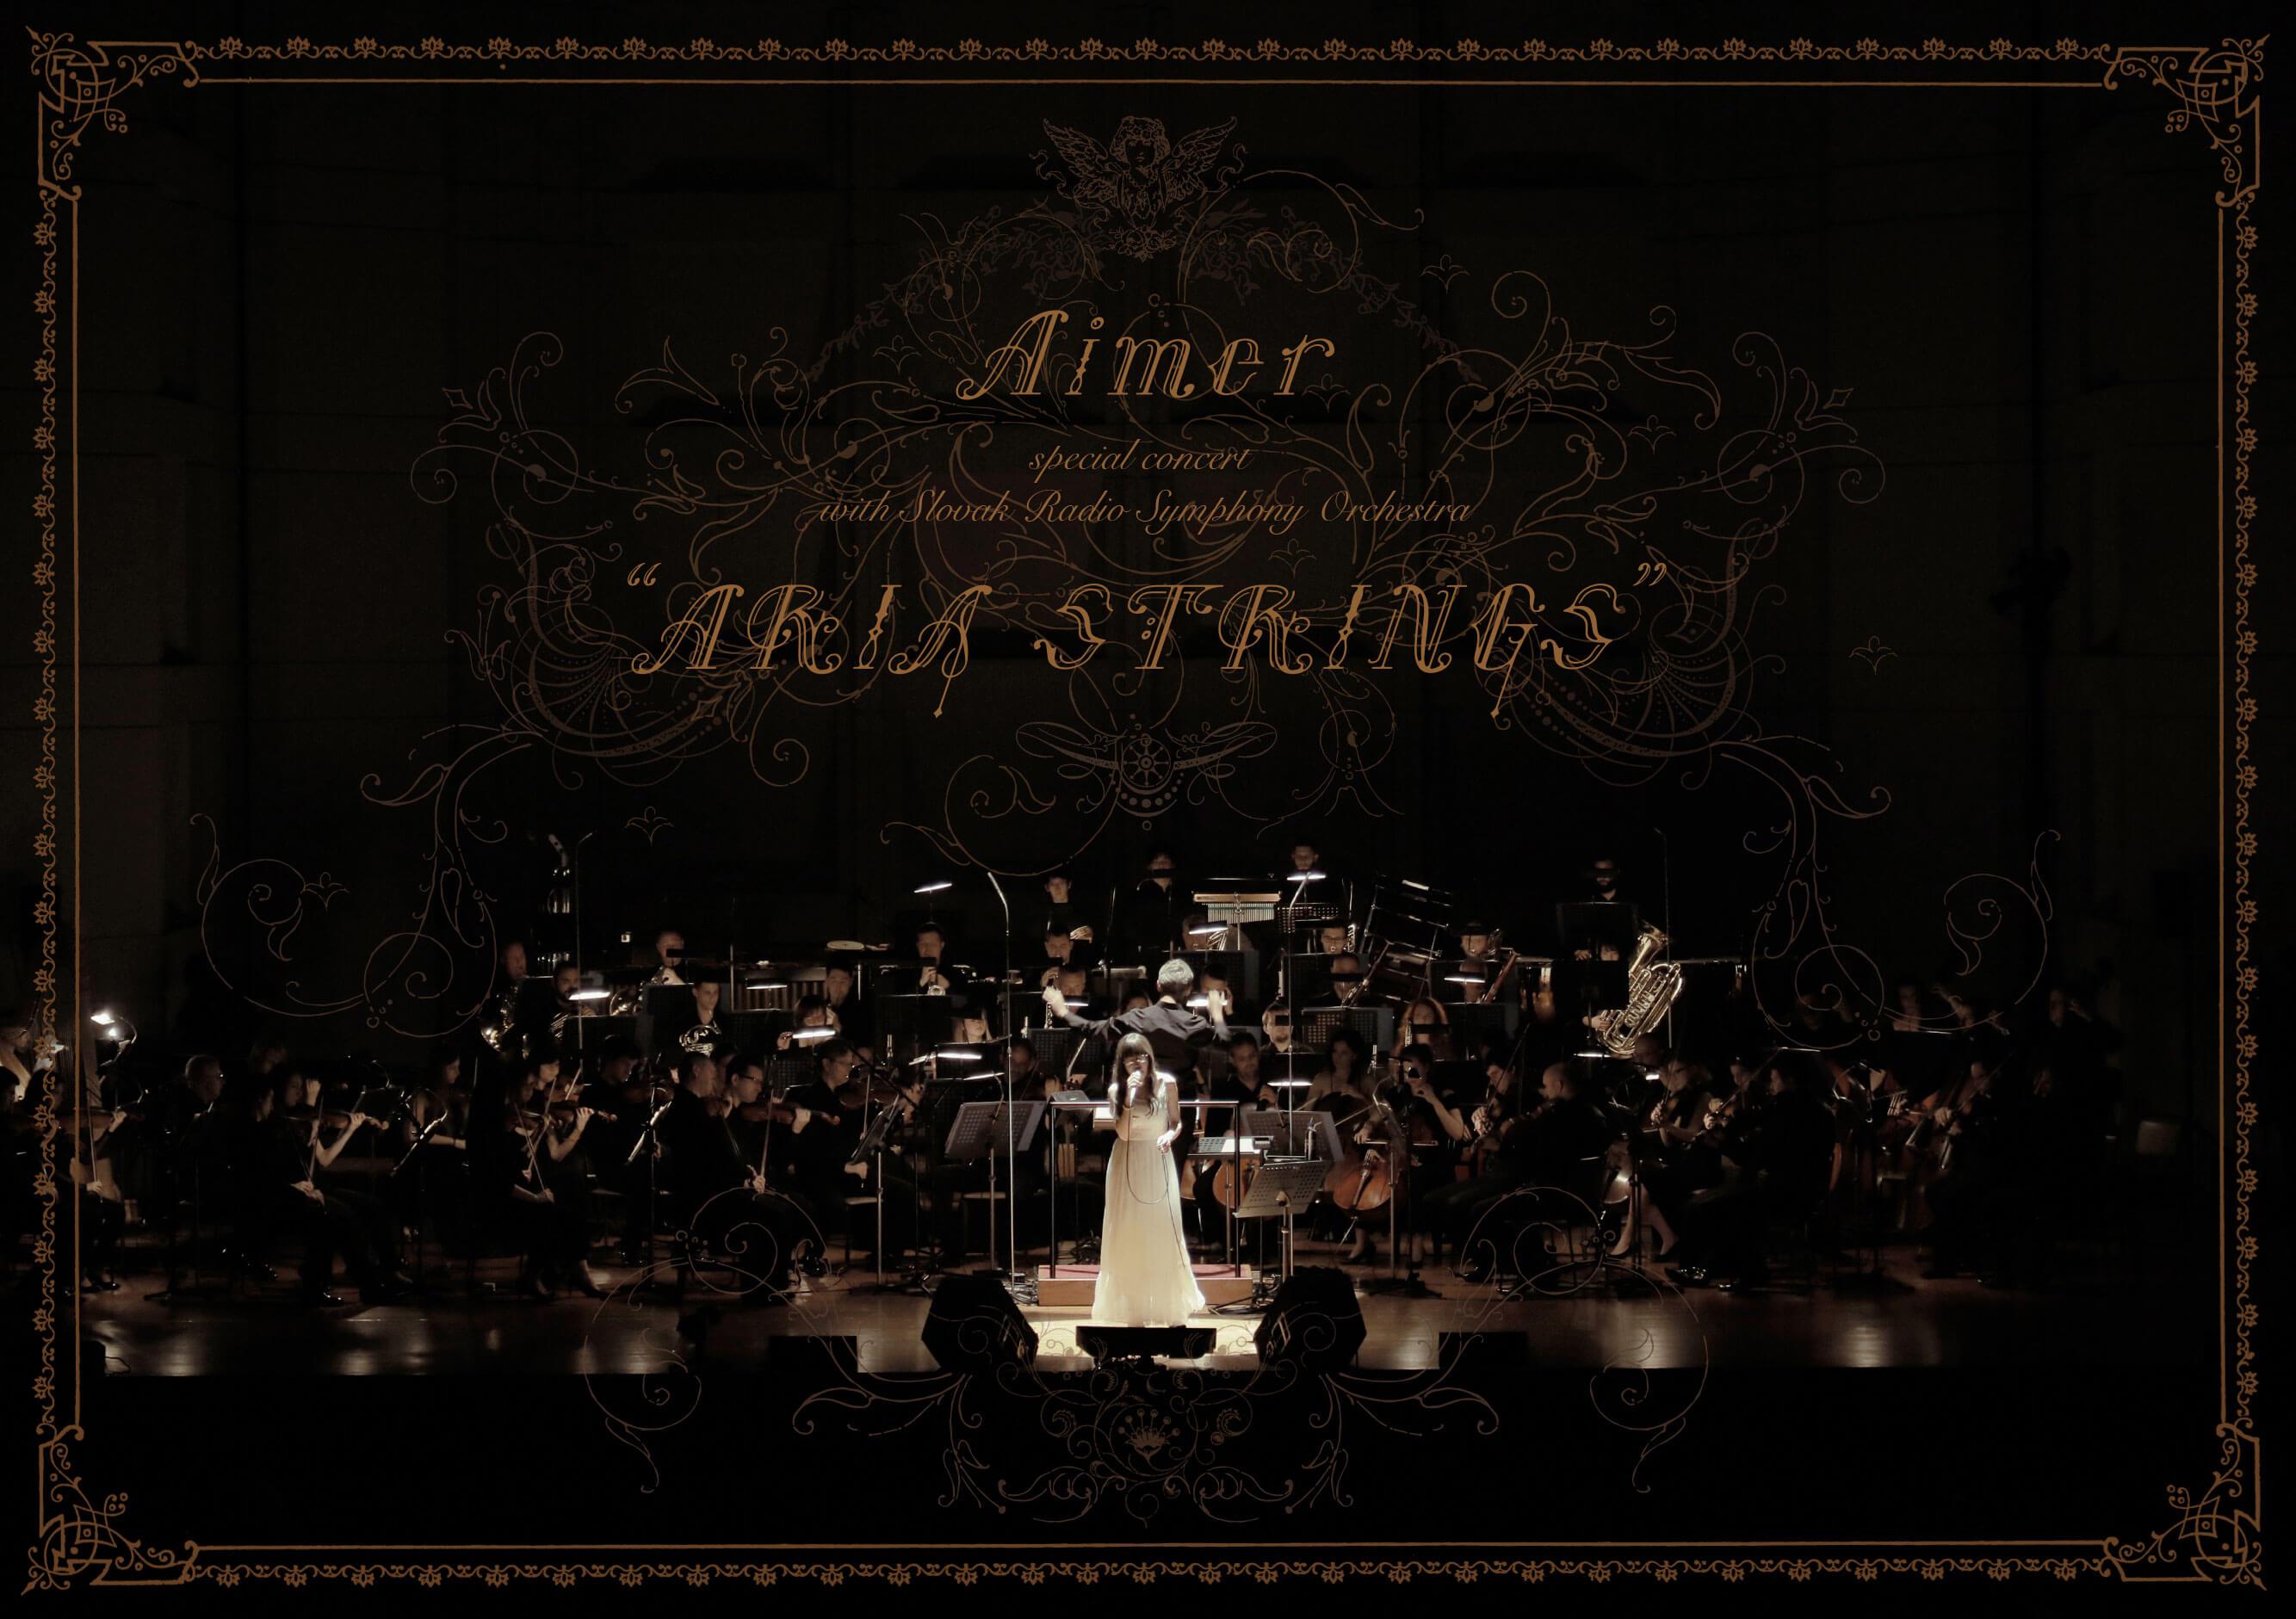 Aimer首場全管弦樂伴奏・個人演唱會「ARIA STRINGS」化為DVD商品發售 Aimer_、